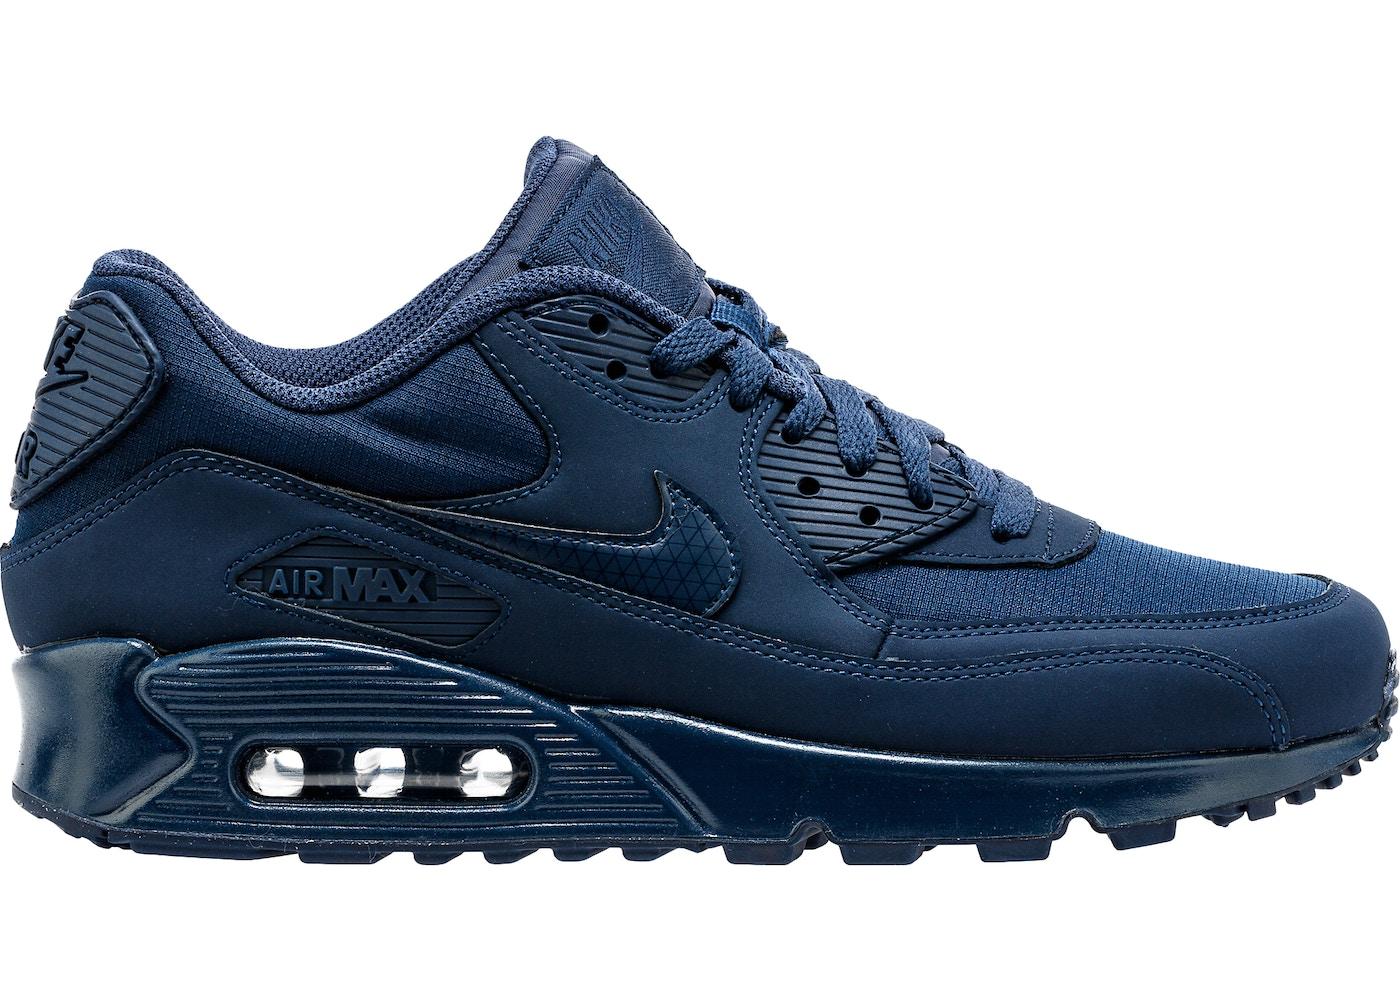 progenie máquina Silicio  Nike Air Max 90 Midnight Navy (2016) - 537384-412